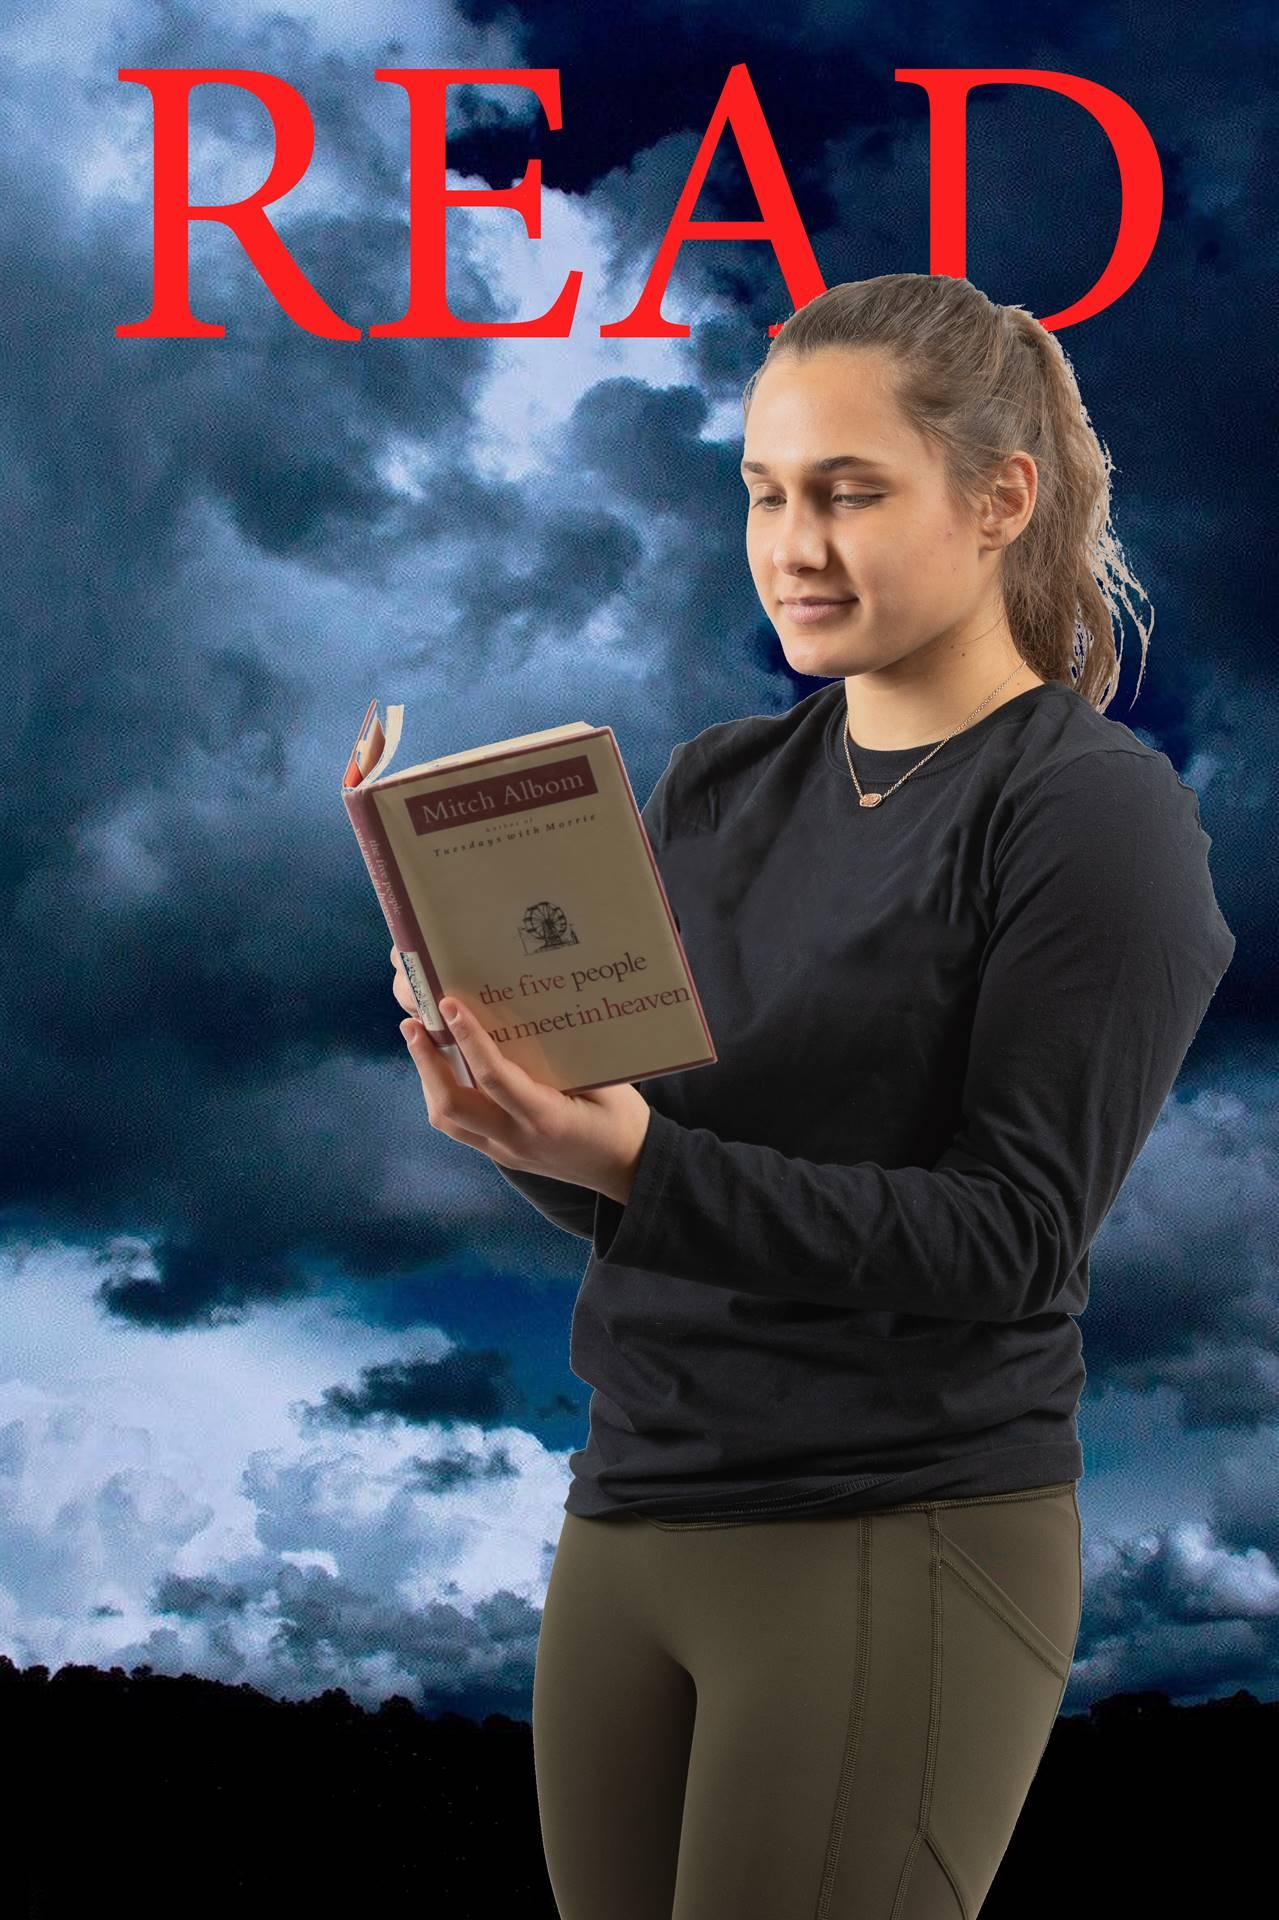 Book Club Co-President Rachel Gold